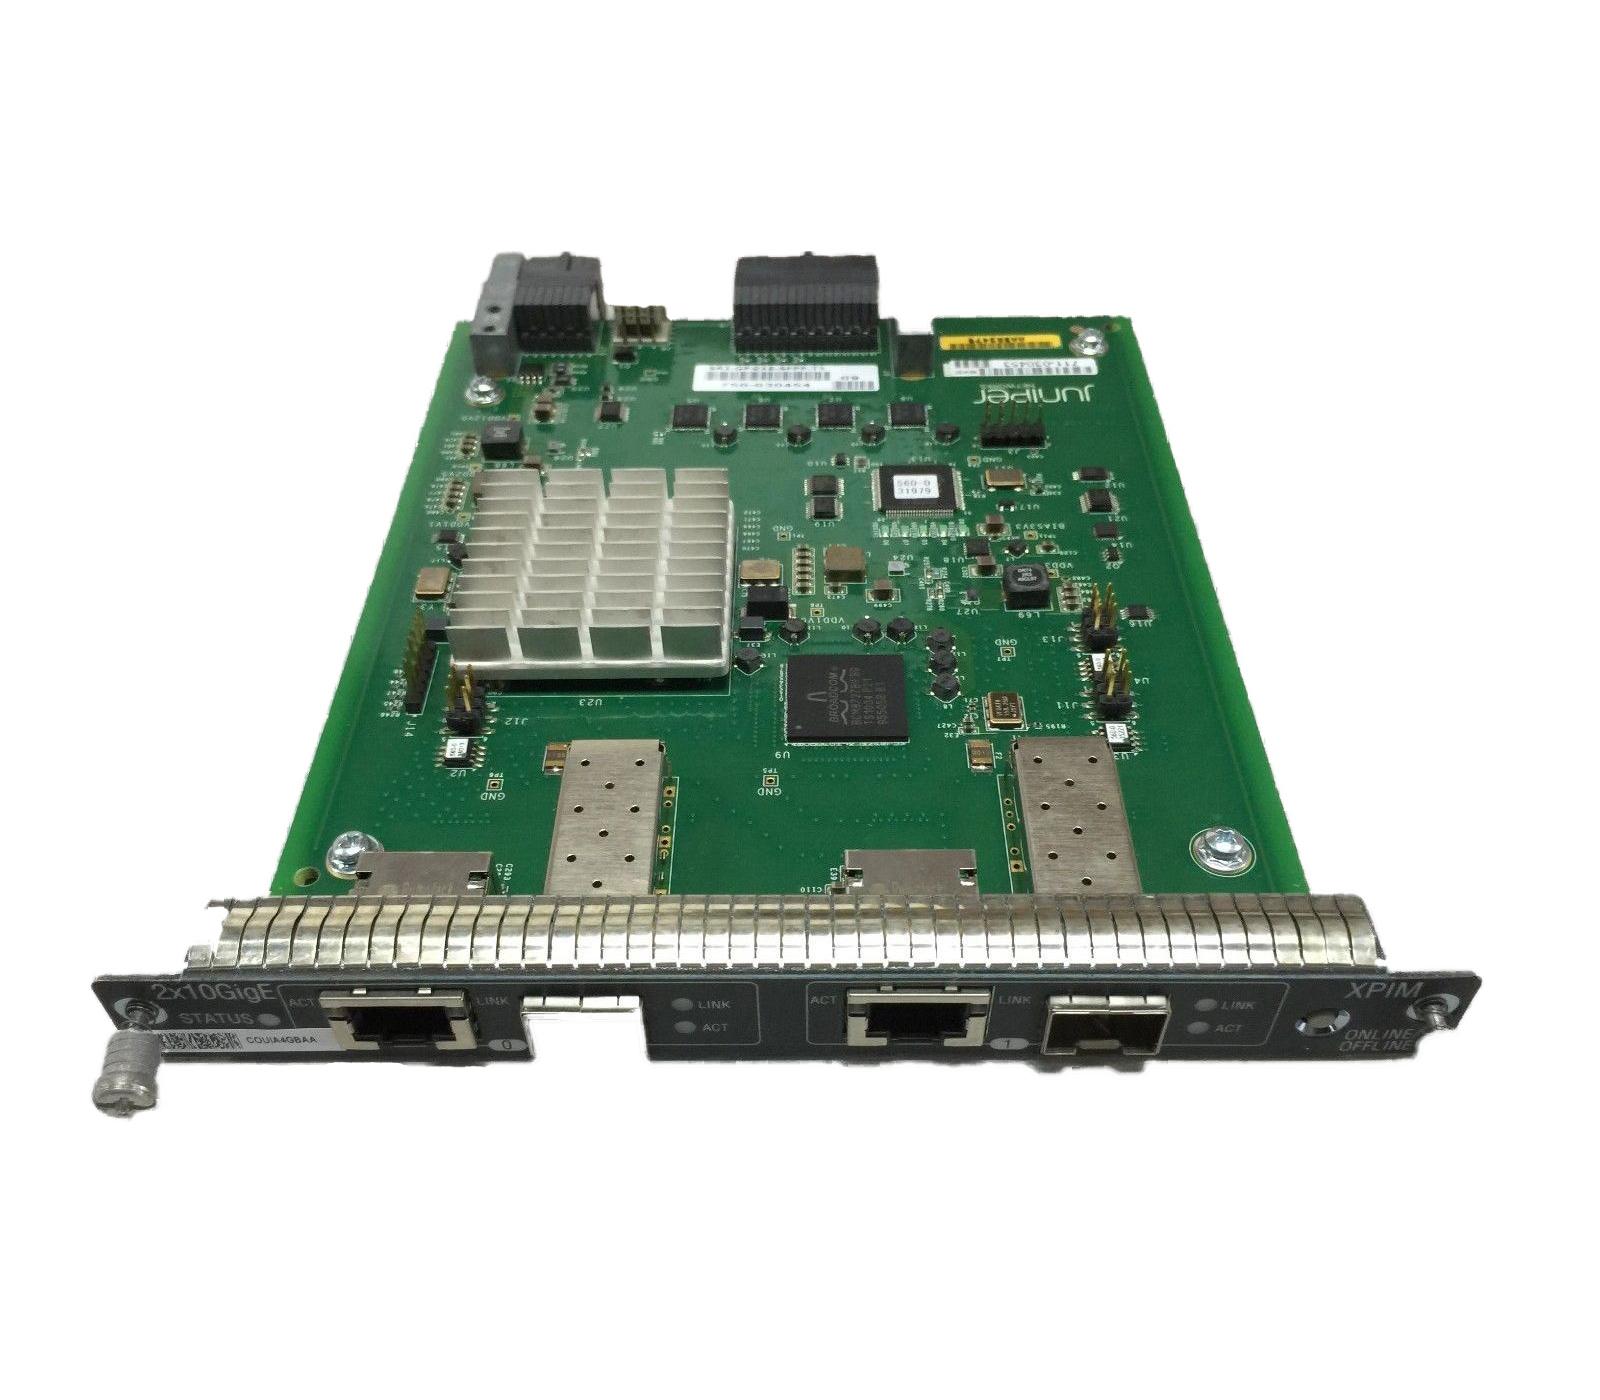 SRX-GP-2XE-SFPP-TX Juniper Networks Juniper SRX-GP-2XE-SFPP-TX Gigabit  Ethernet network switch module